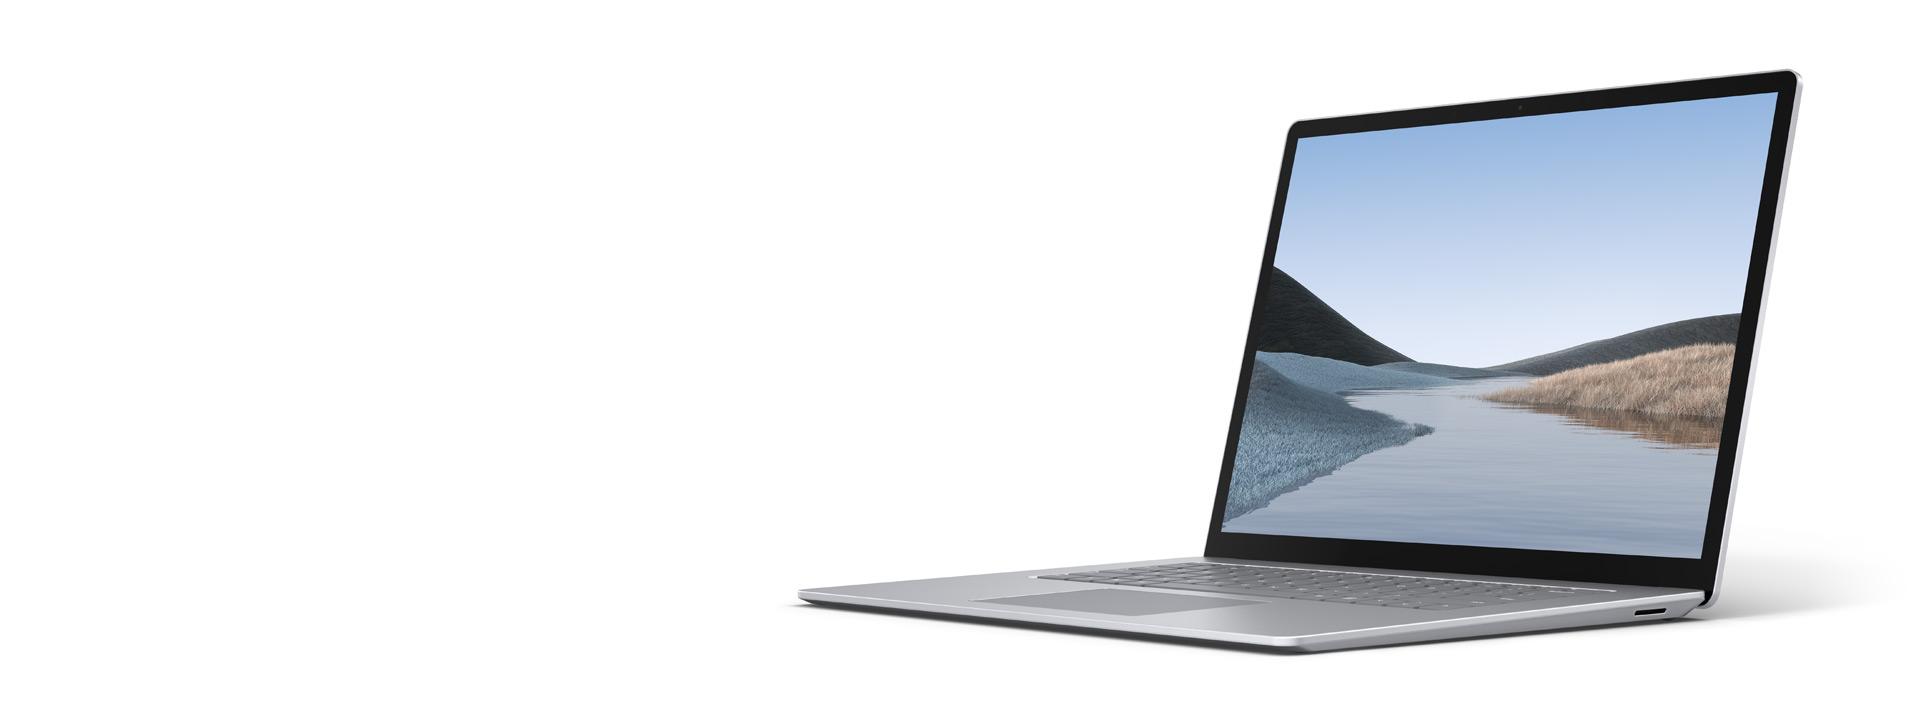 Platina Surface Laptop 3 15 inch